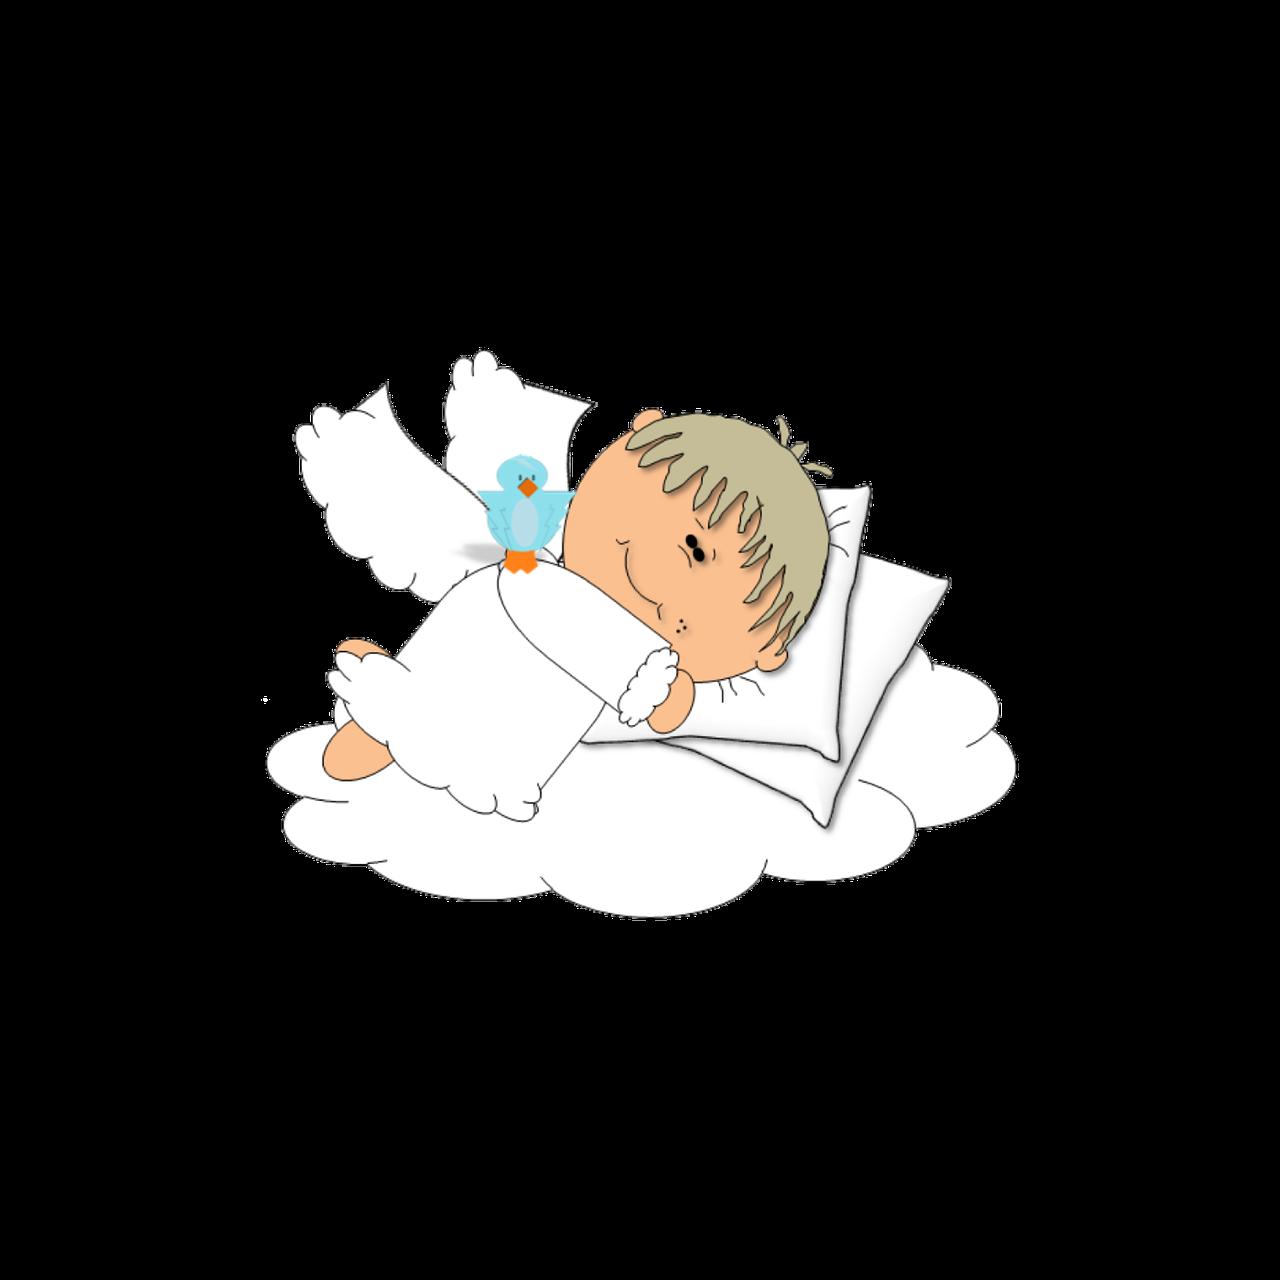 Wednesday clipart happ. Vacation sweet dreams angel